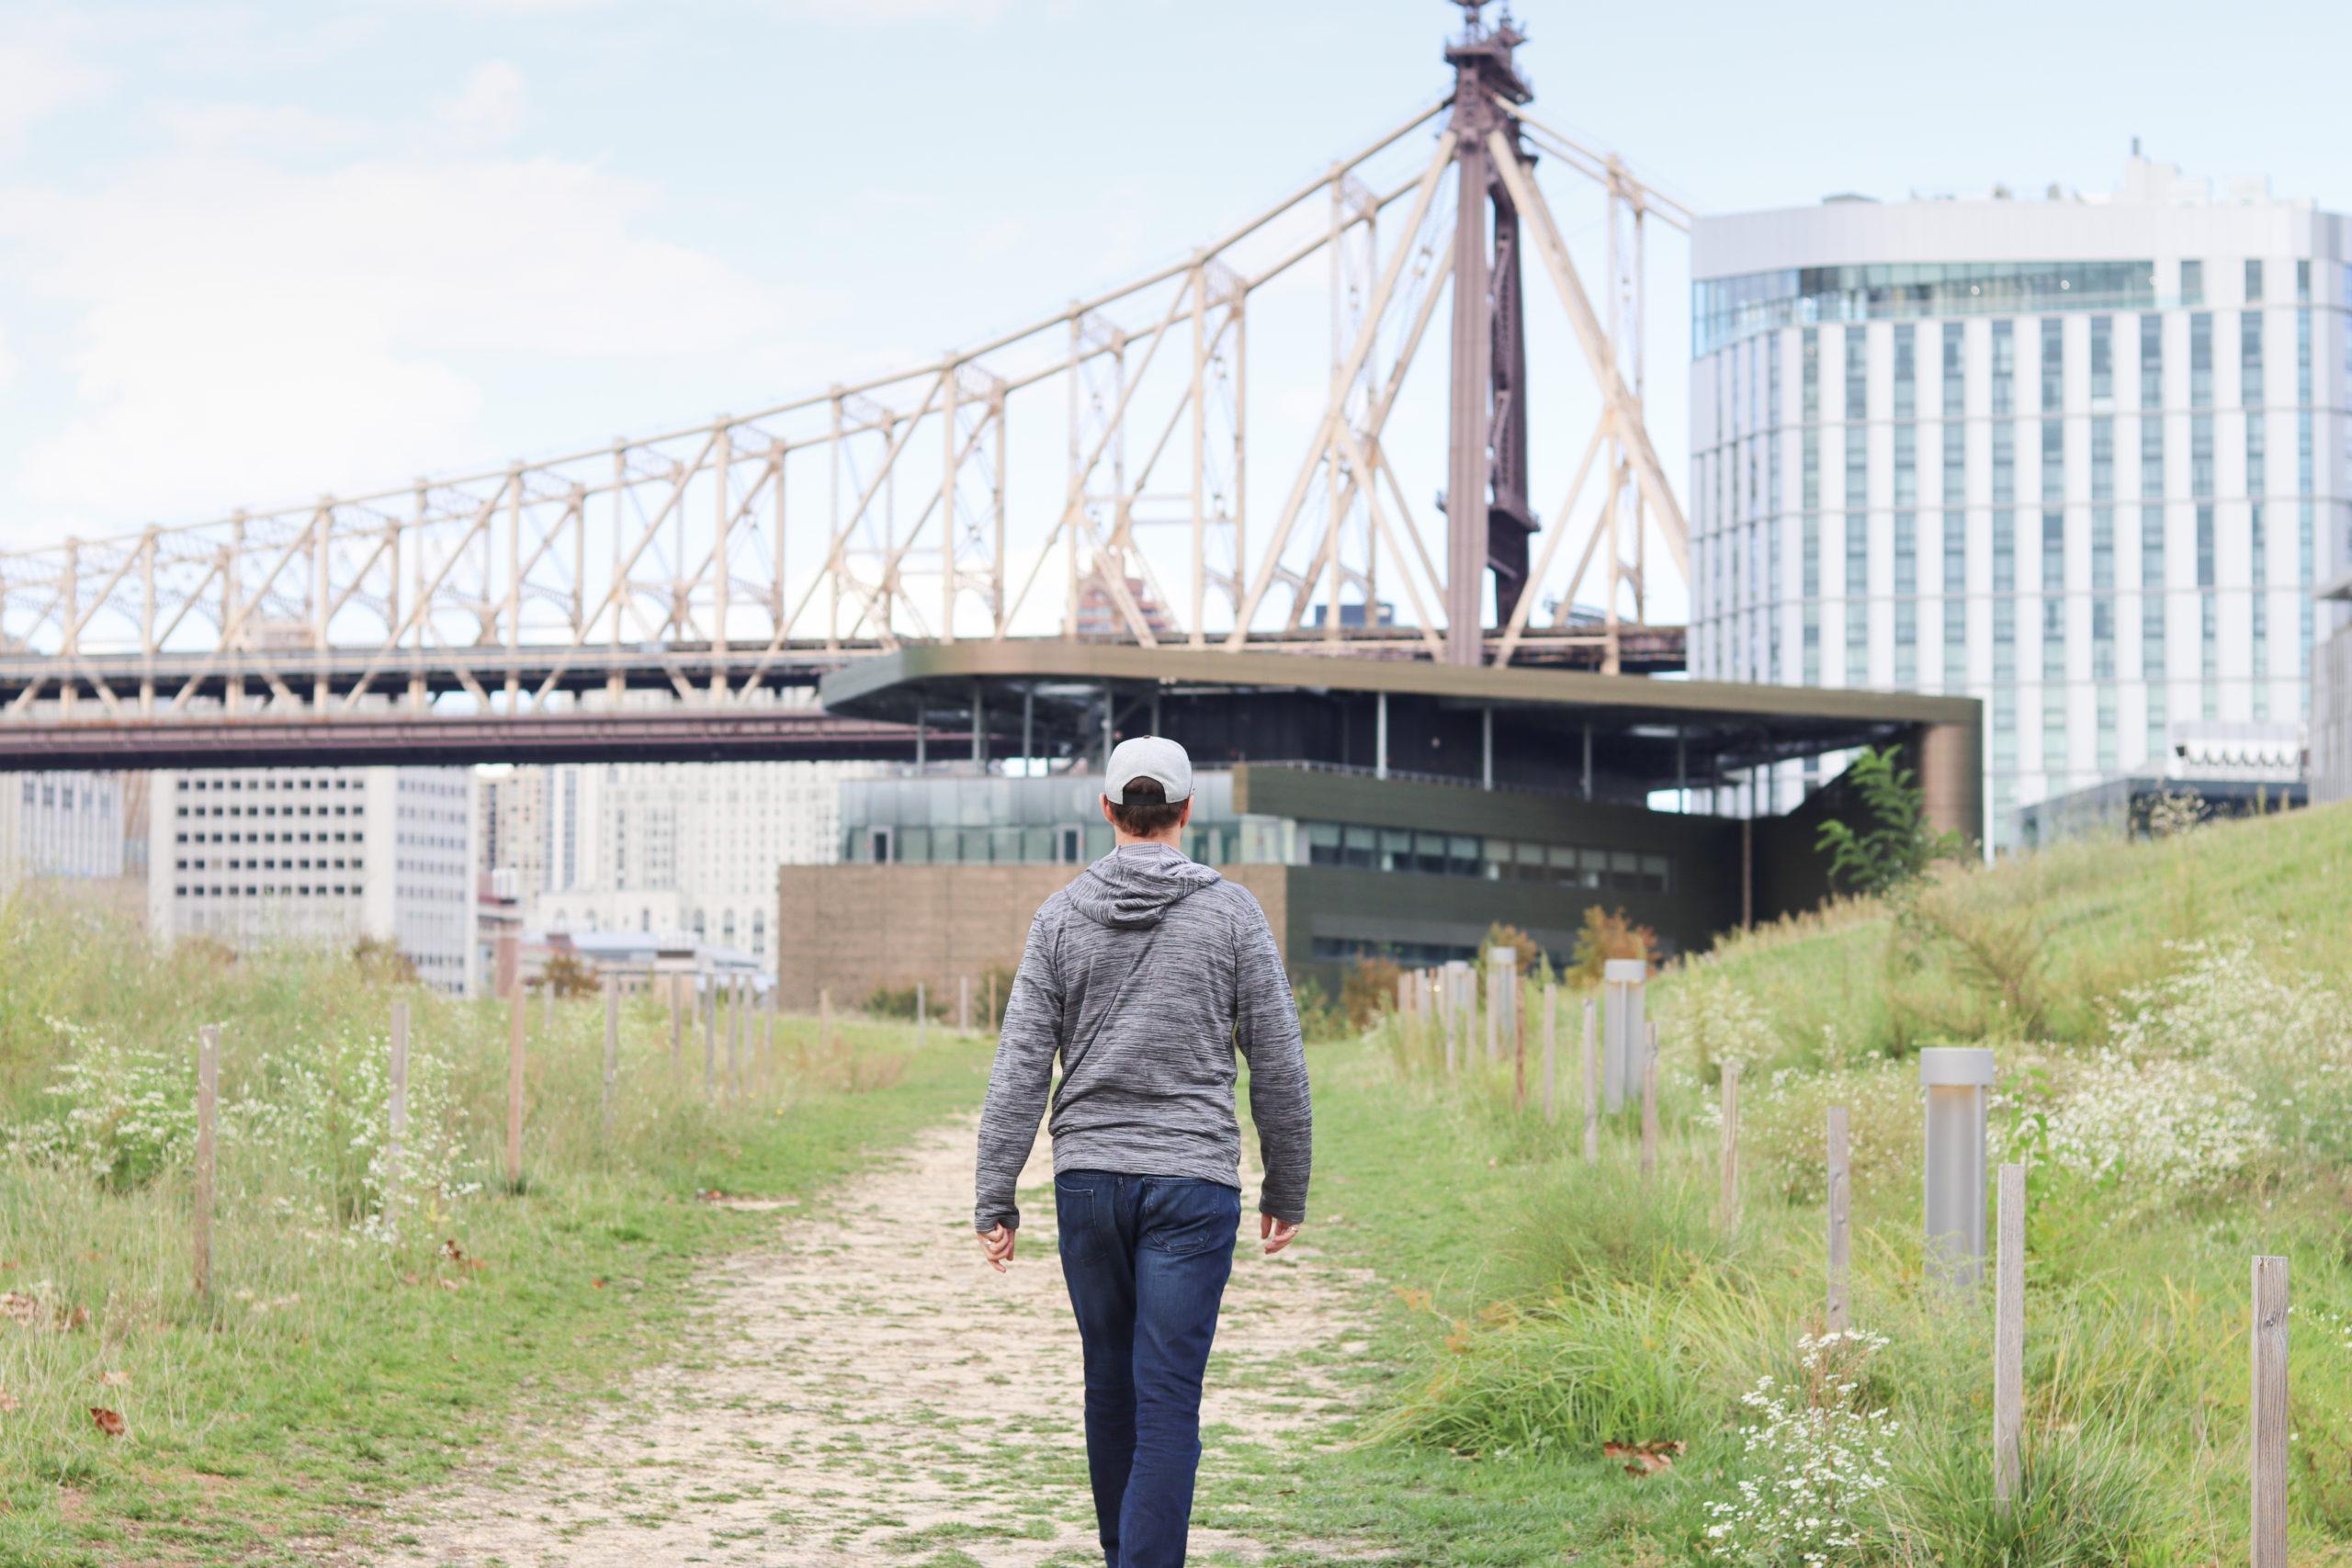 Roosevelt Island View of the Queensboro Bridge